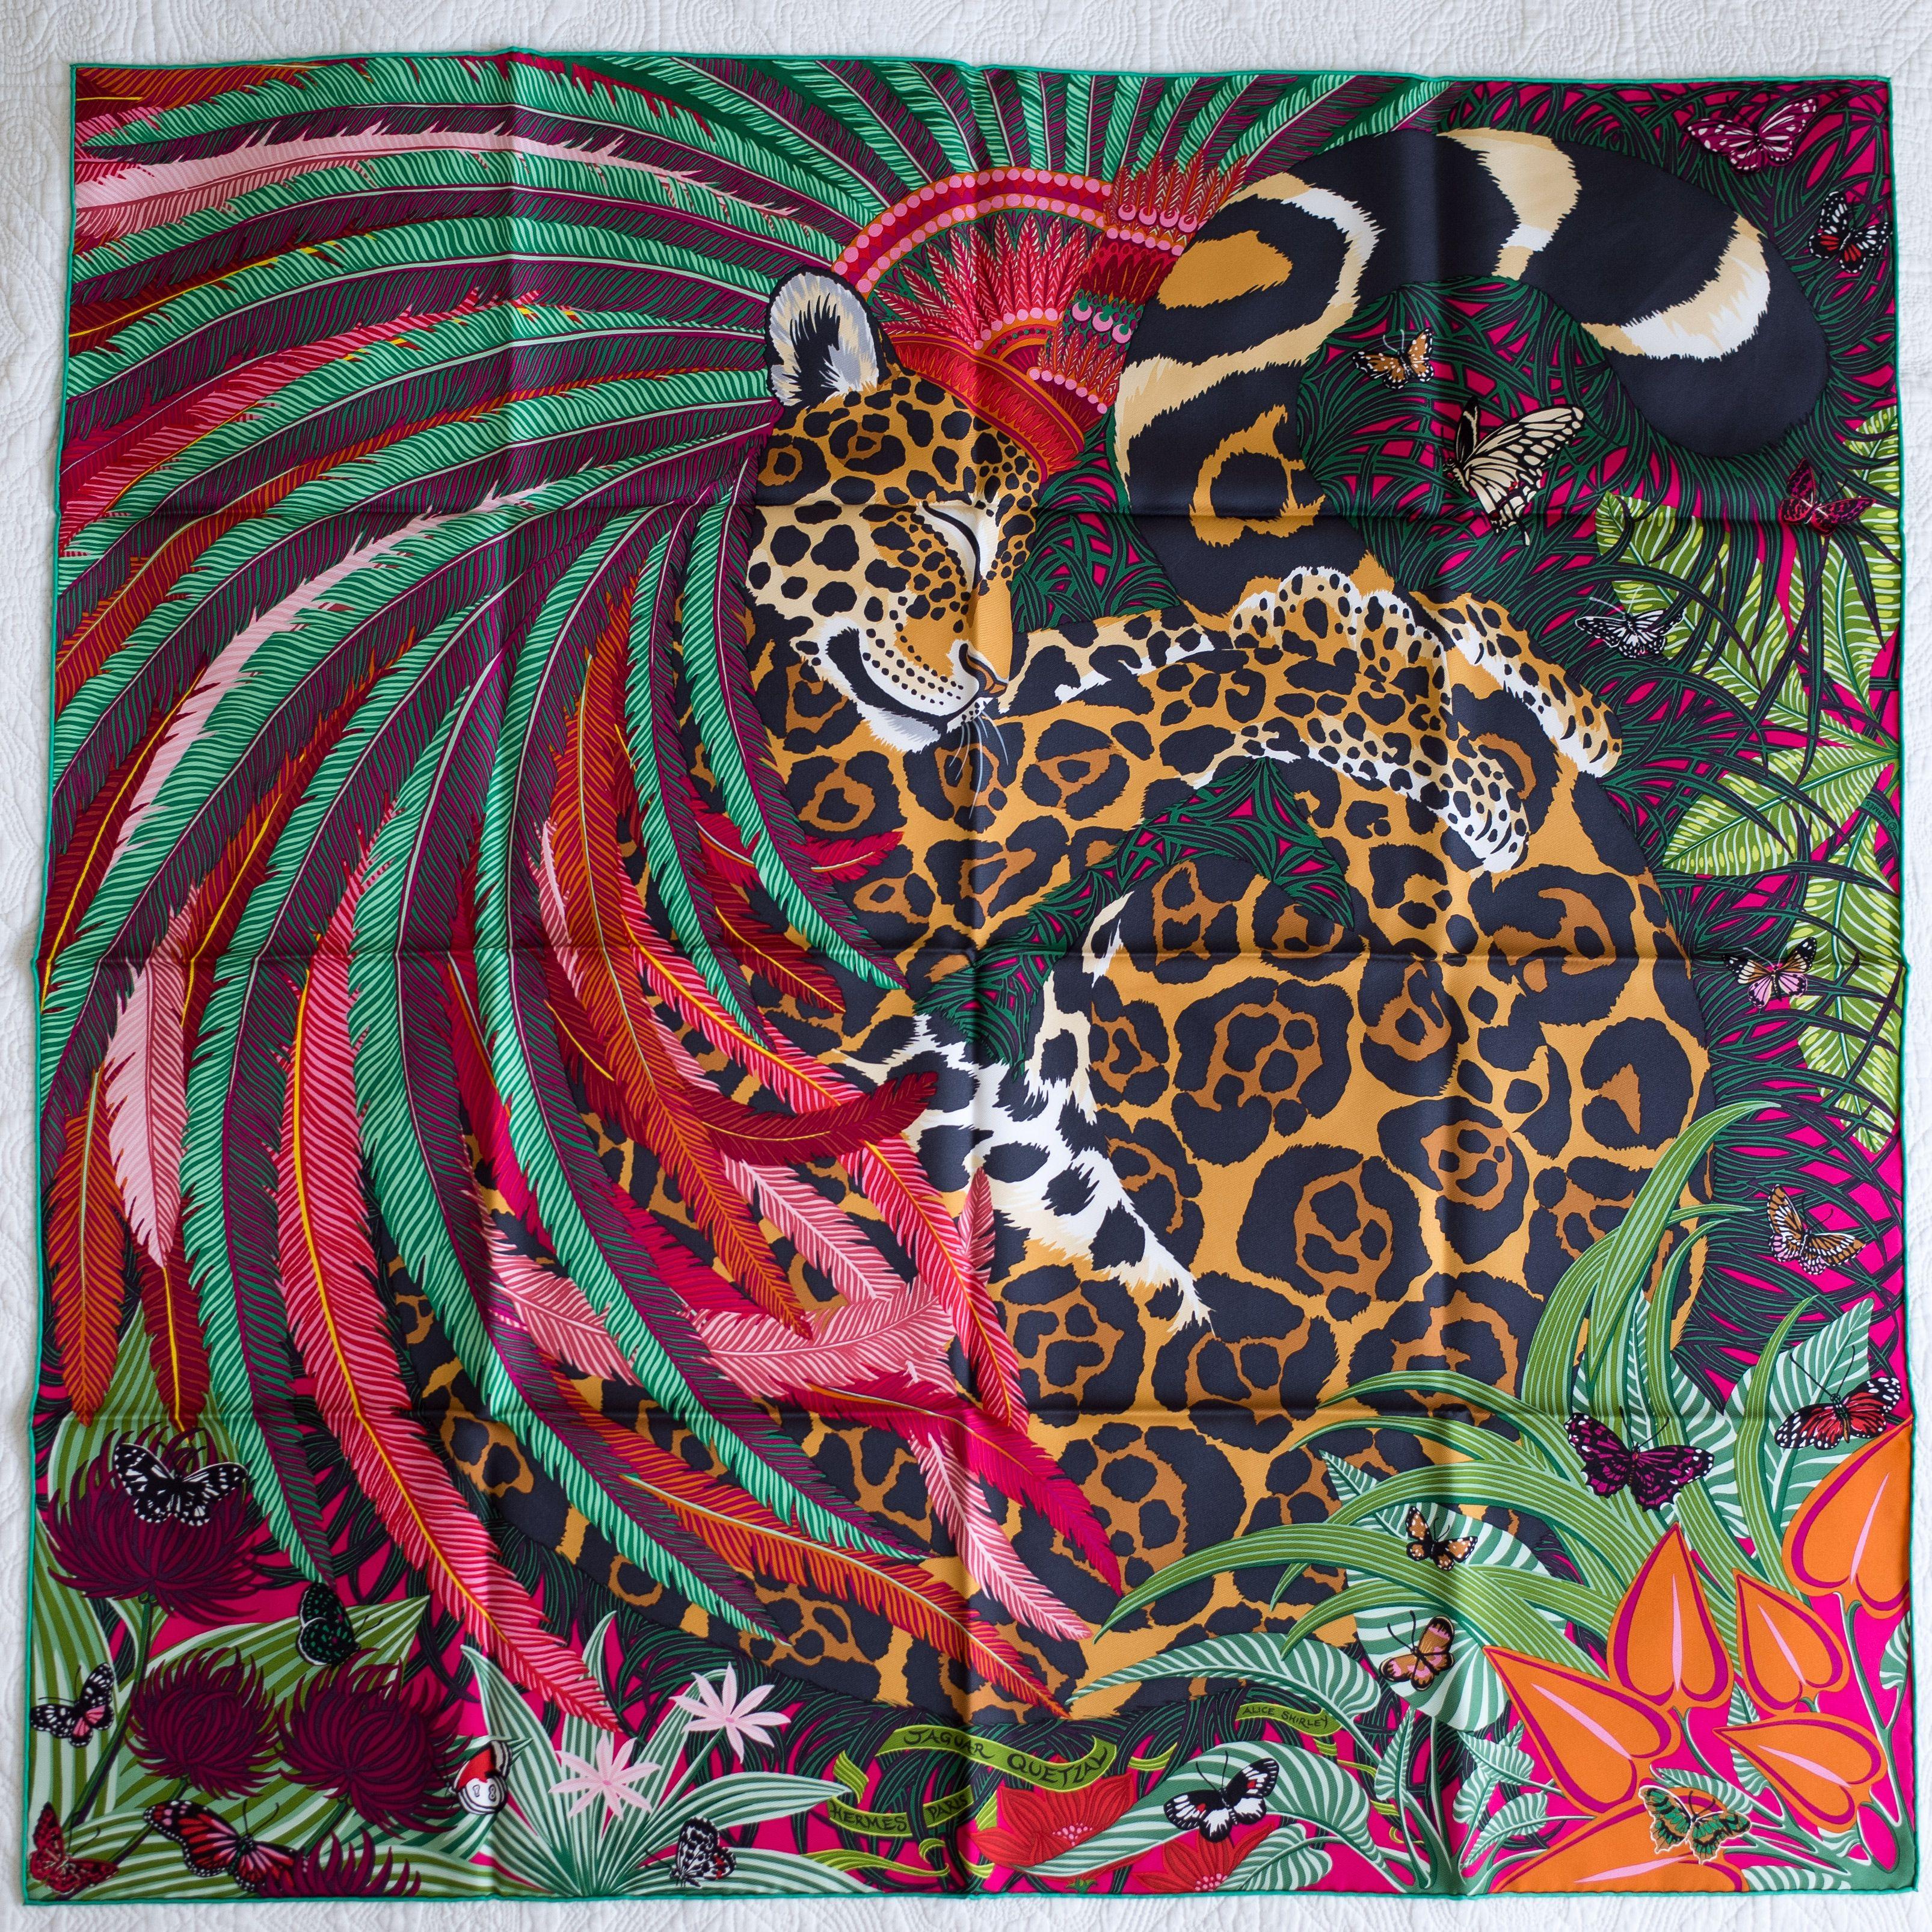 Jaguar Quetzal by Hermes  hermes  passionforelegance   1 Hermès - H ... 3fd154a32cd